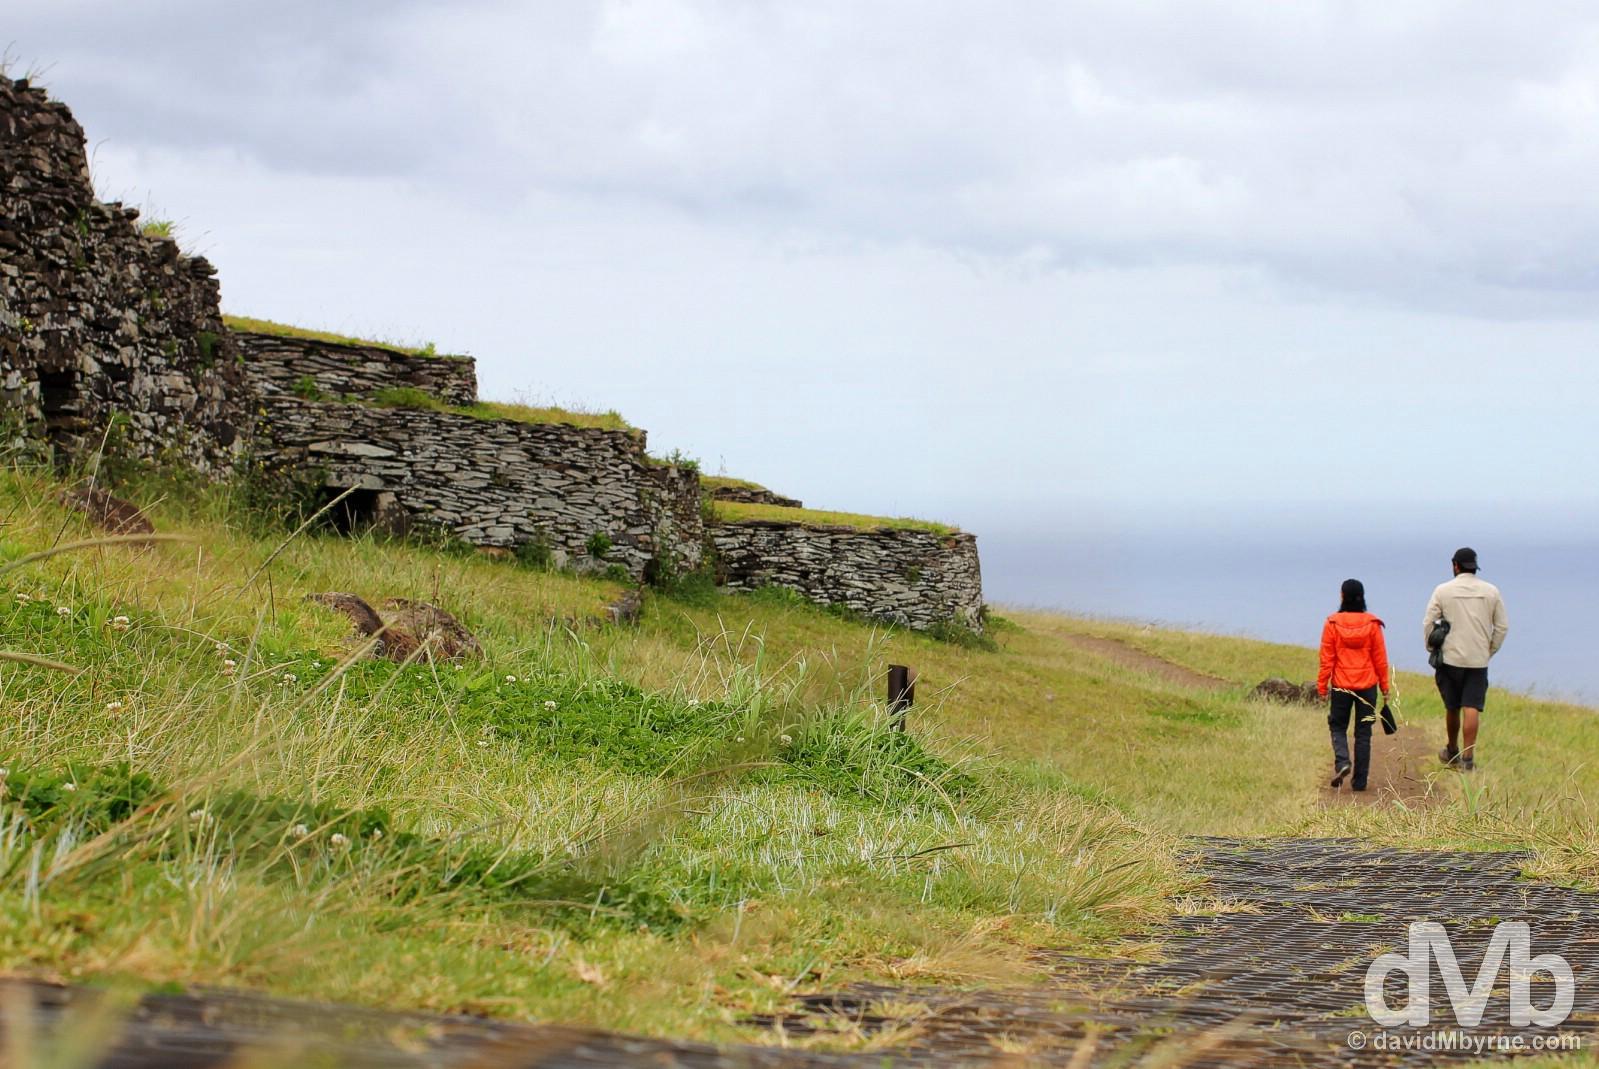 Orongo, Easter Island, Chile. September 28, 2016.